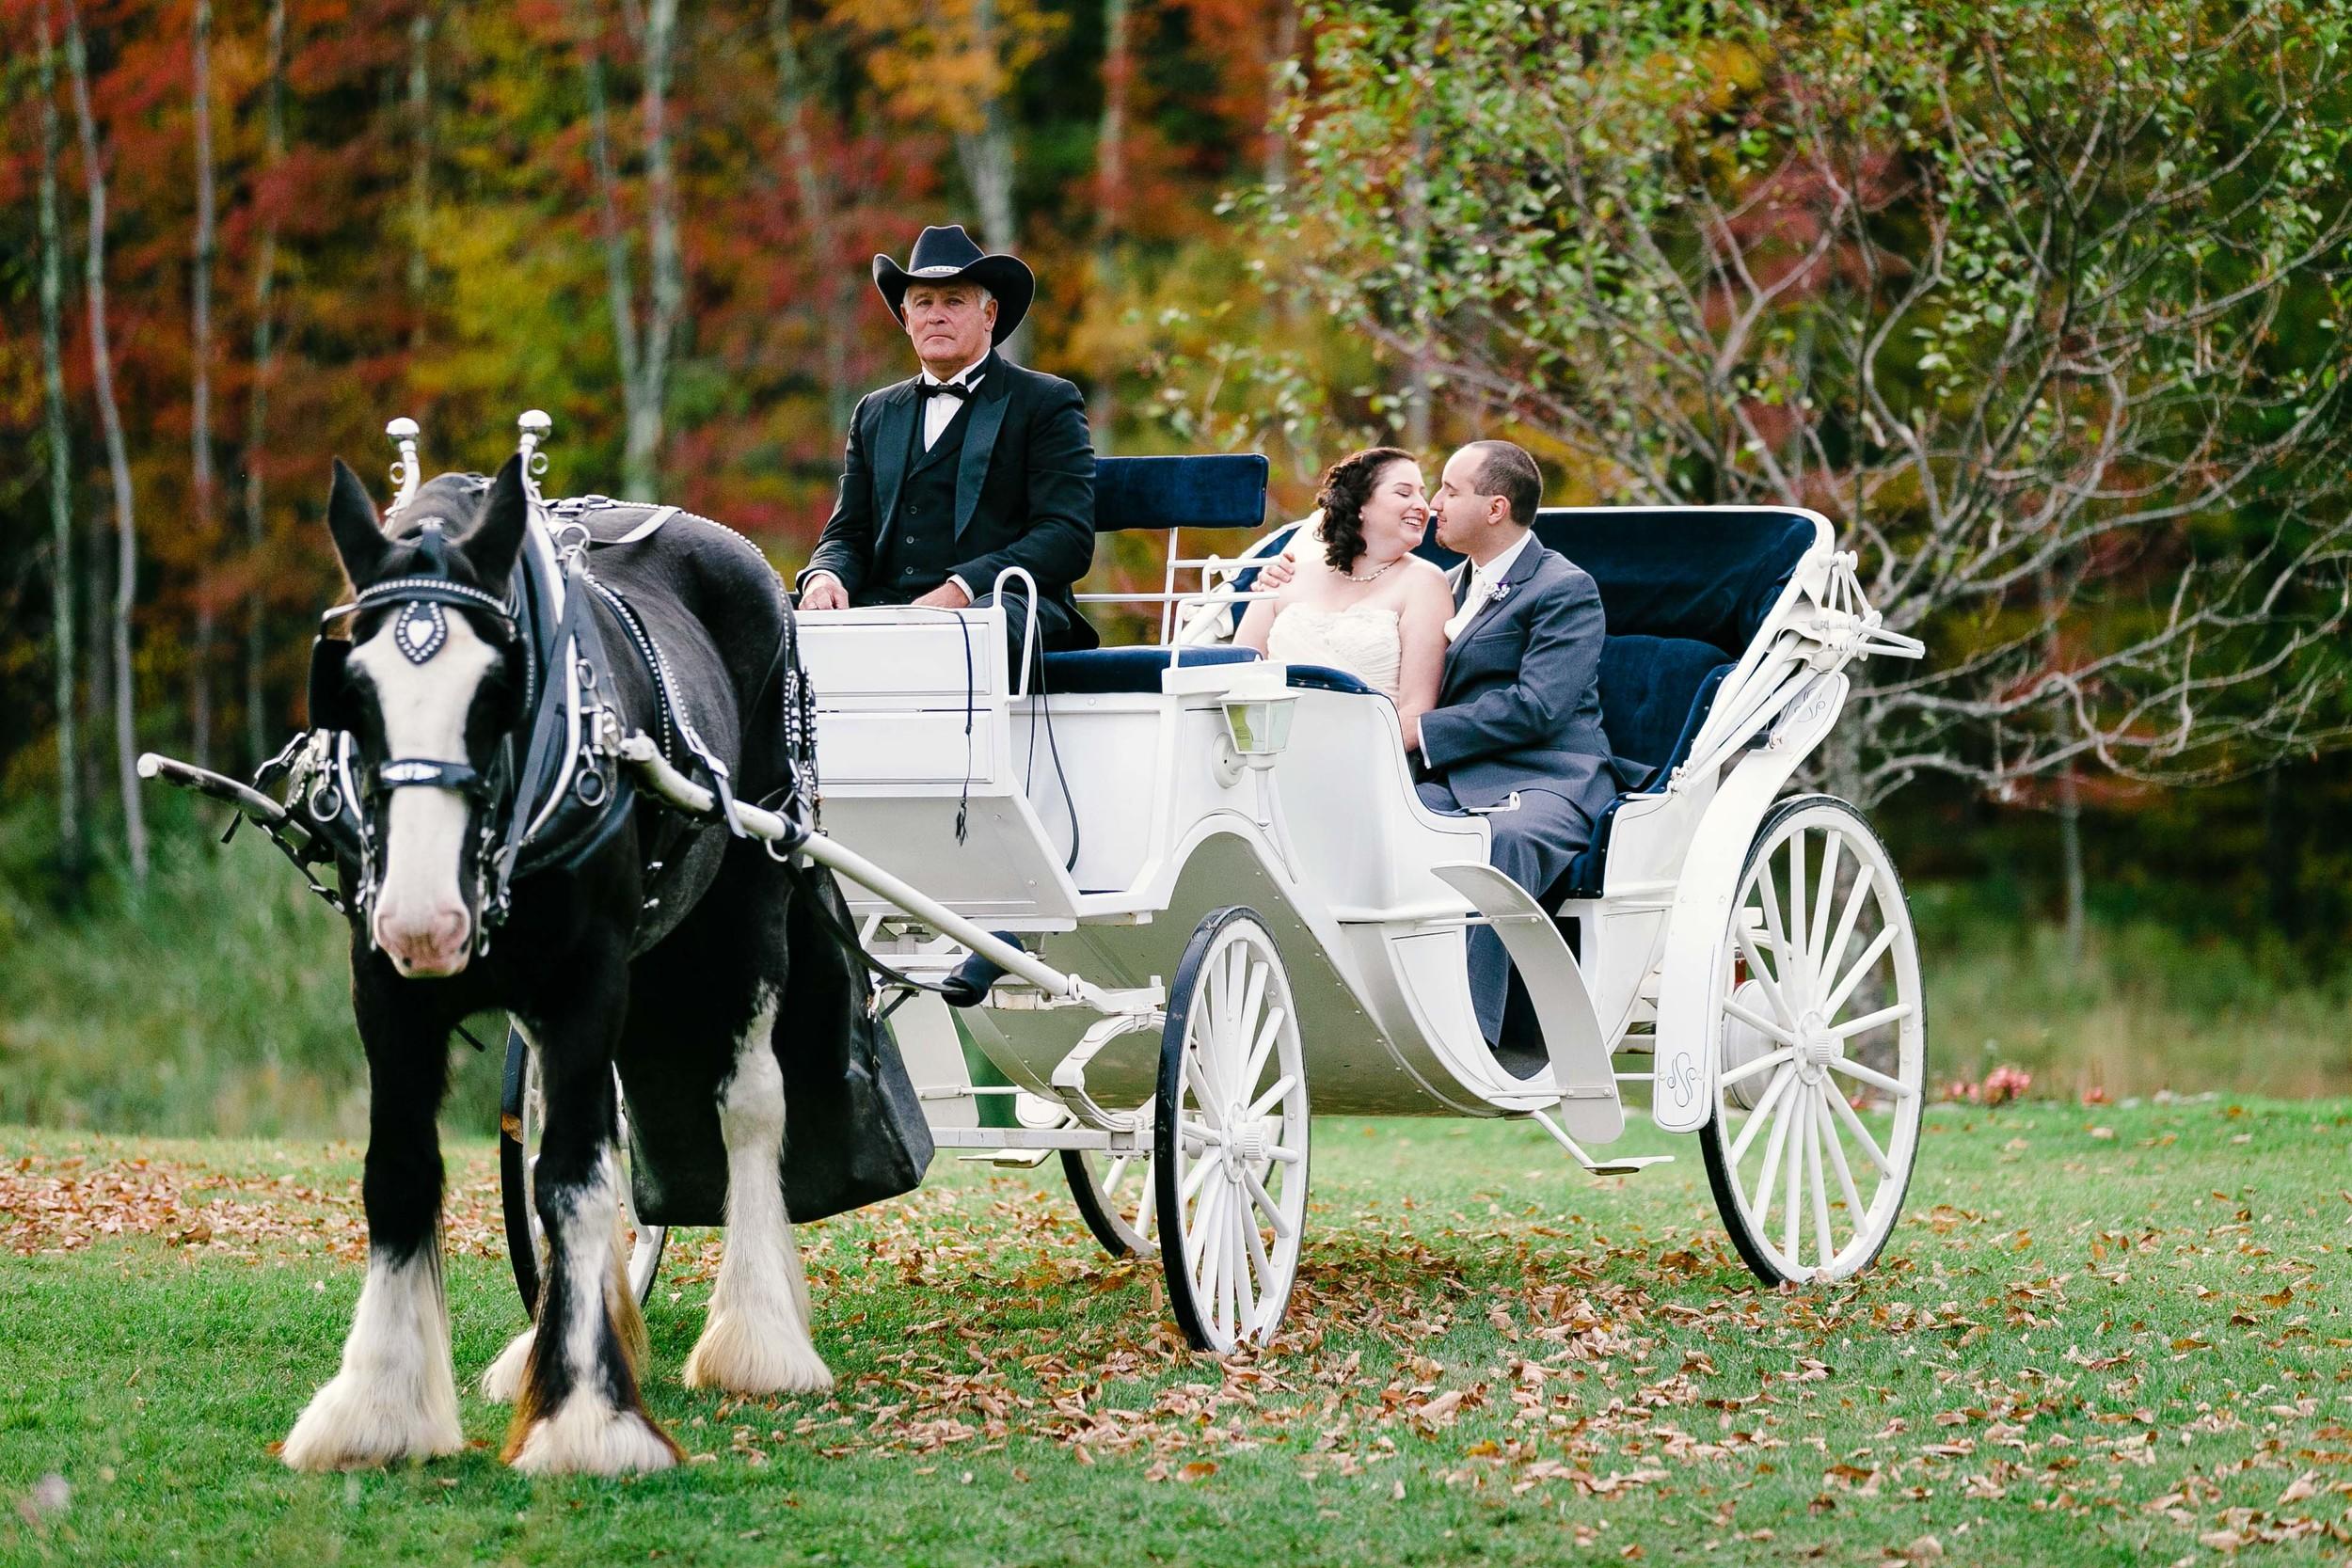 Beautifull-New-England-Fall-Wedding-Wood-Acress-Connecticut-Jacek-Dolata-Photography-8.jpg